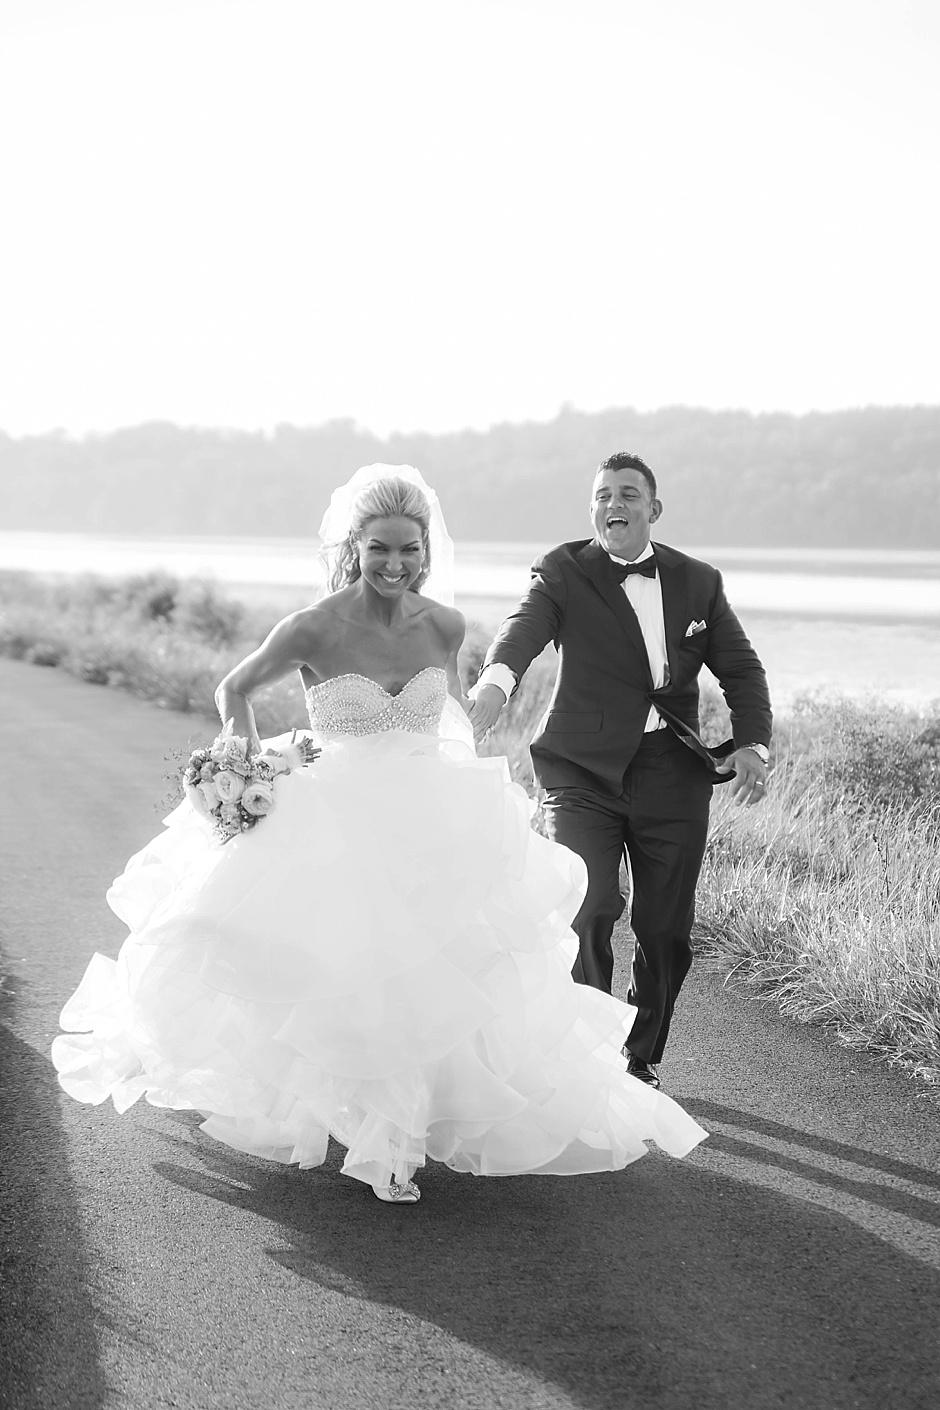 Makenna + Brandon Wedding_M Harris Studios_1125.jpg